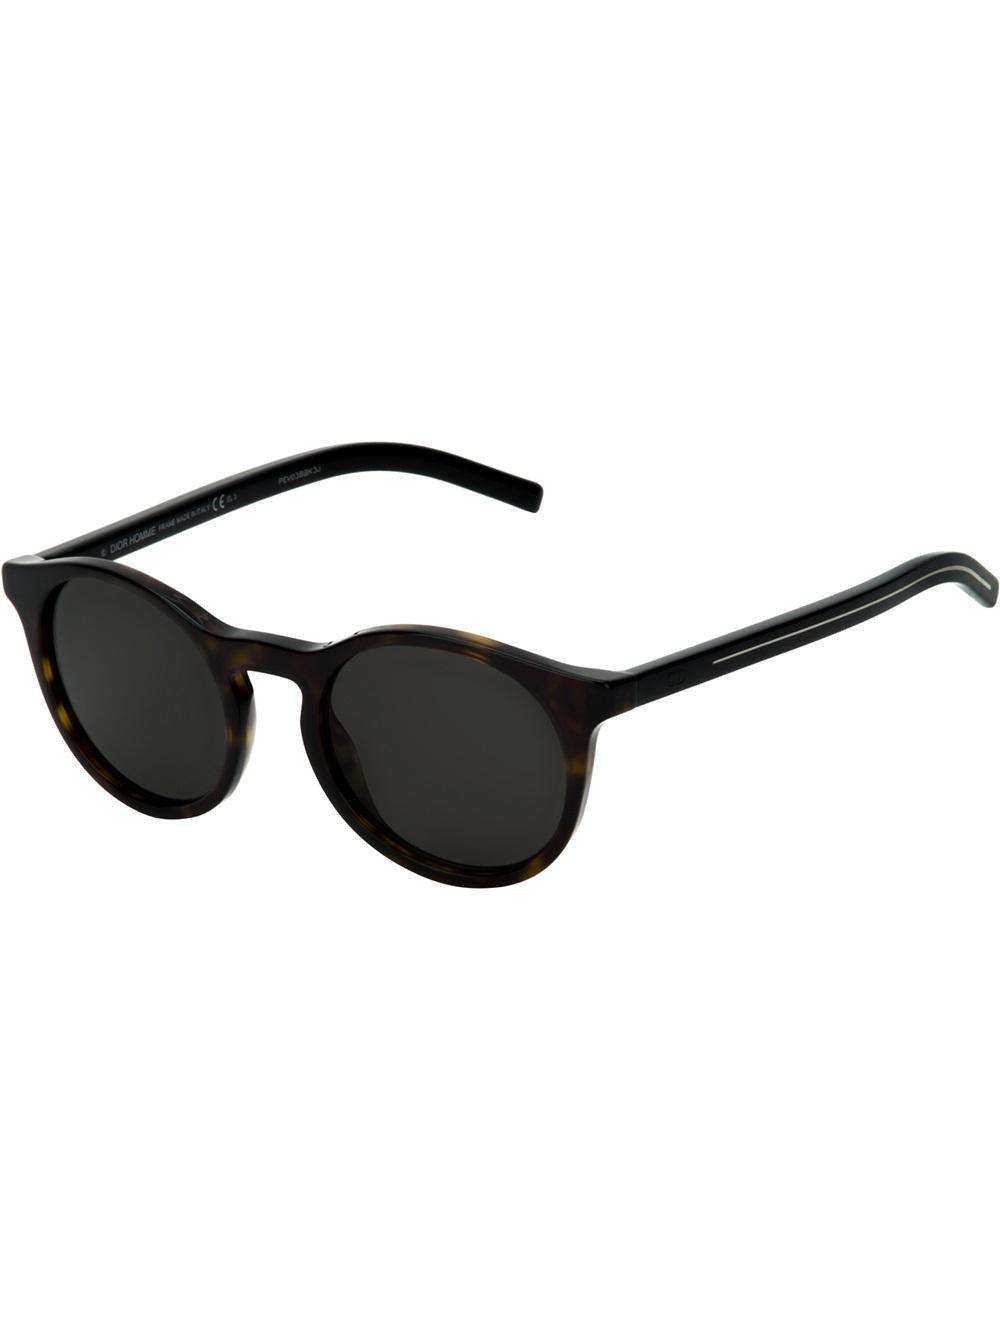 Dior Men Sunglasses – Black Golden Frame – HX-16863 - MS5